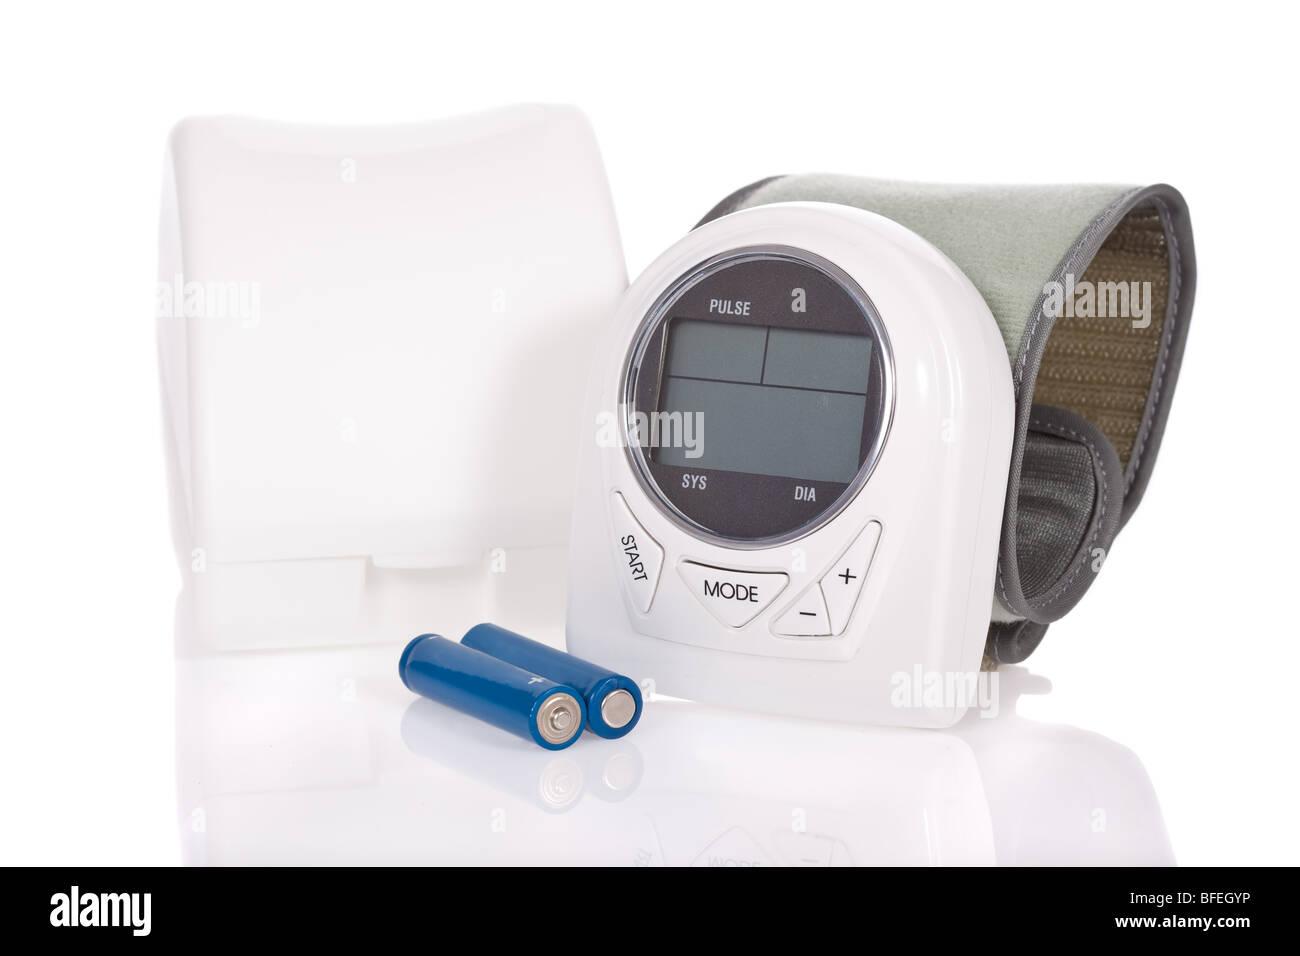 Wrist sphygmomanometer (blood pressure measure equipment) isolated on white background - Stock Image